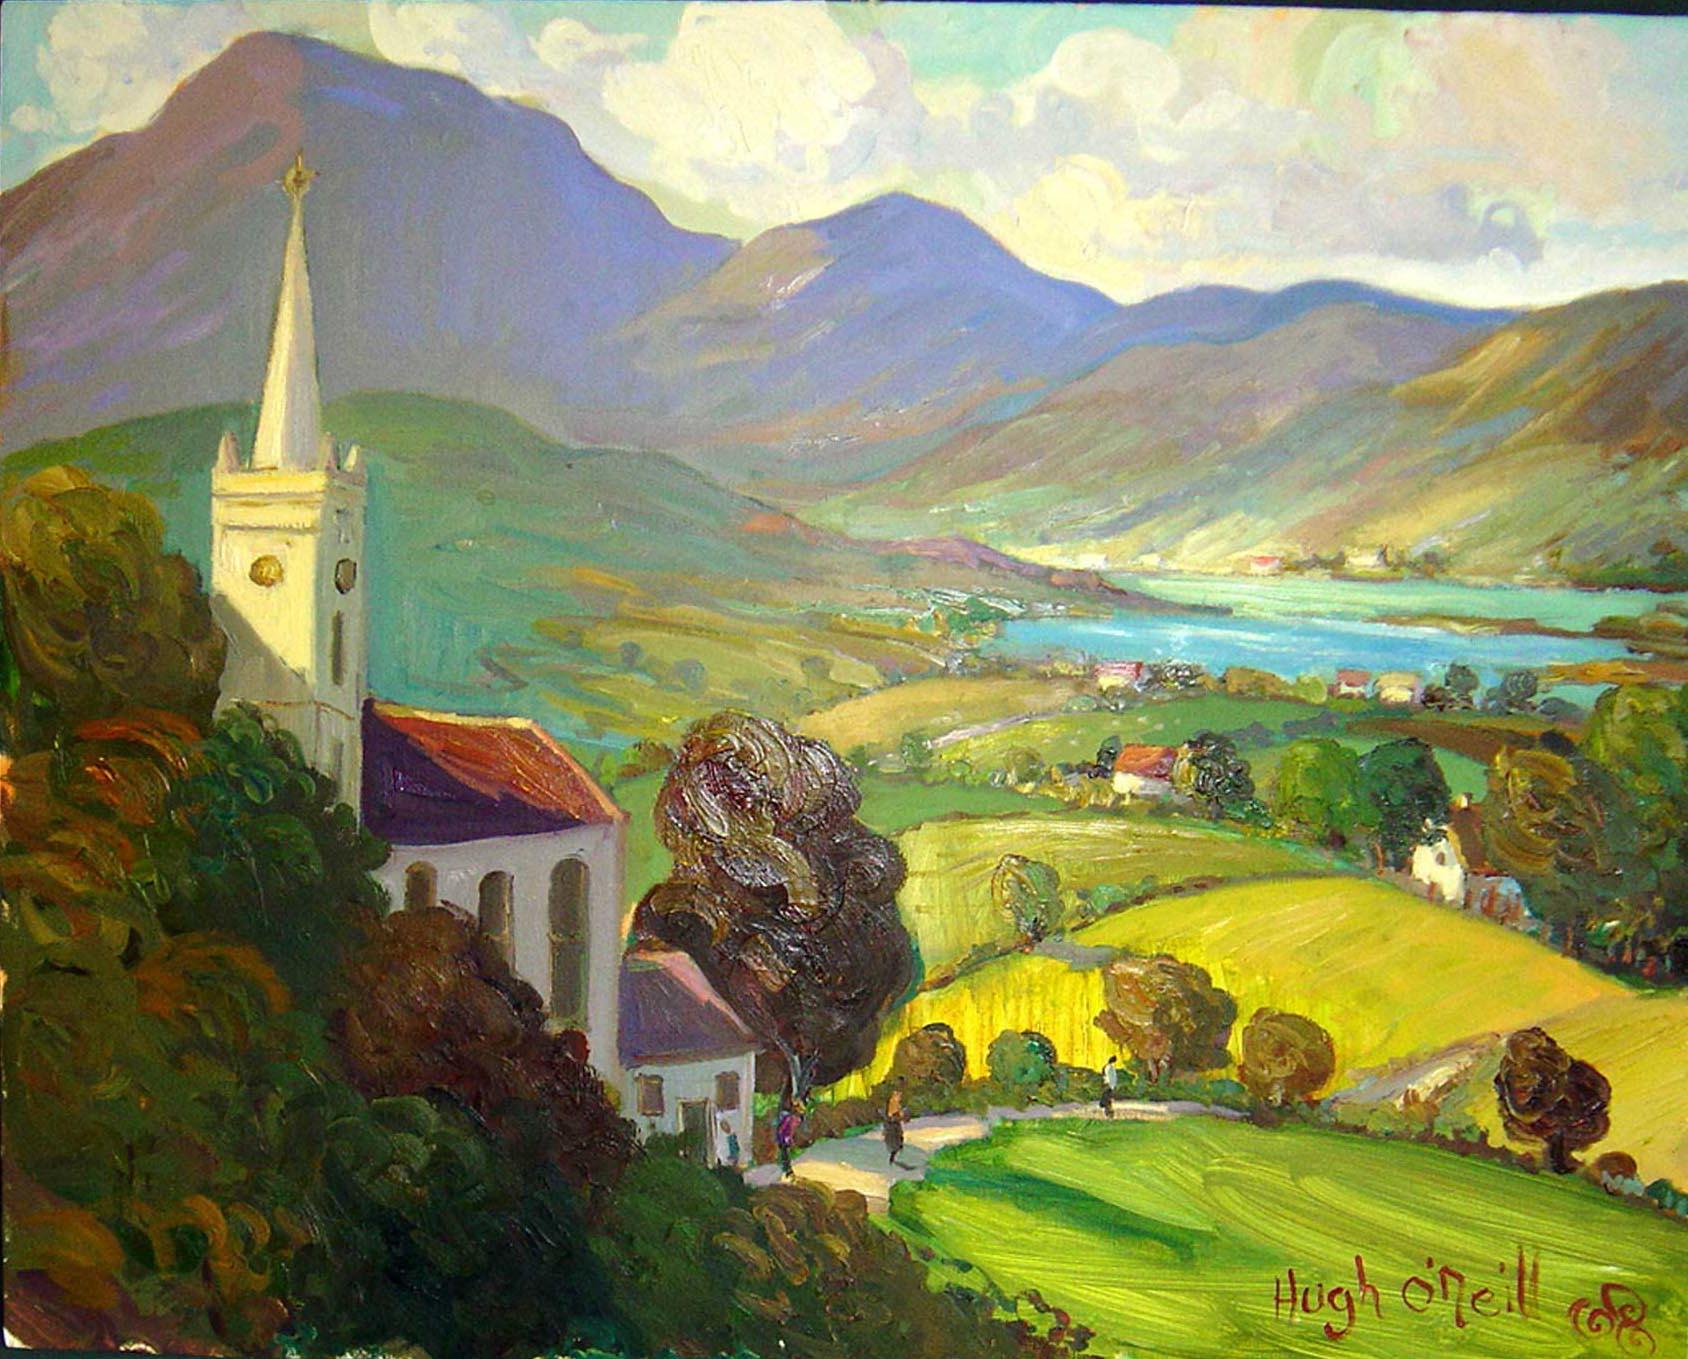 Irish art workshops